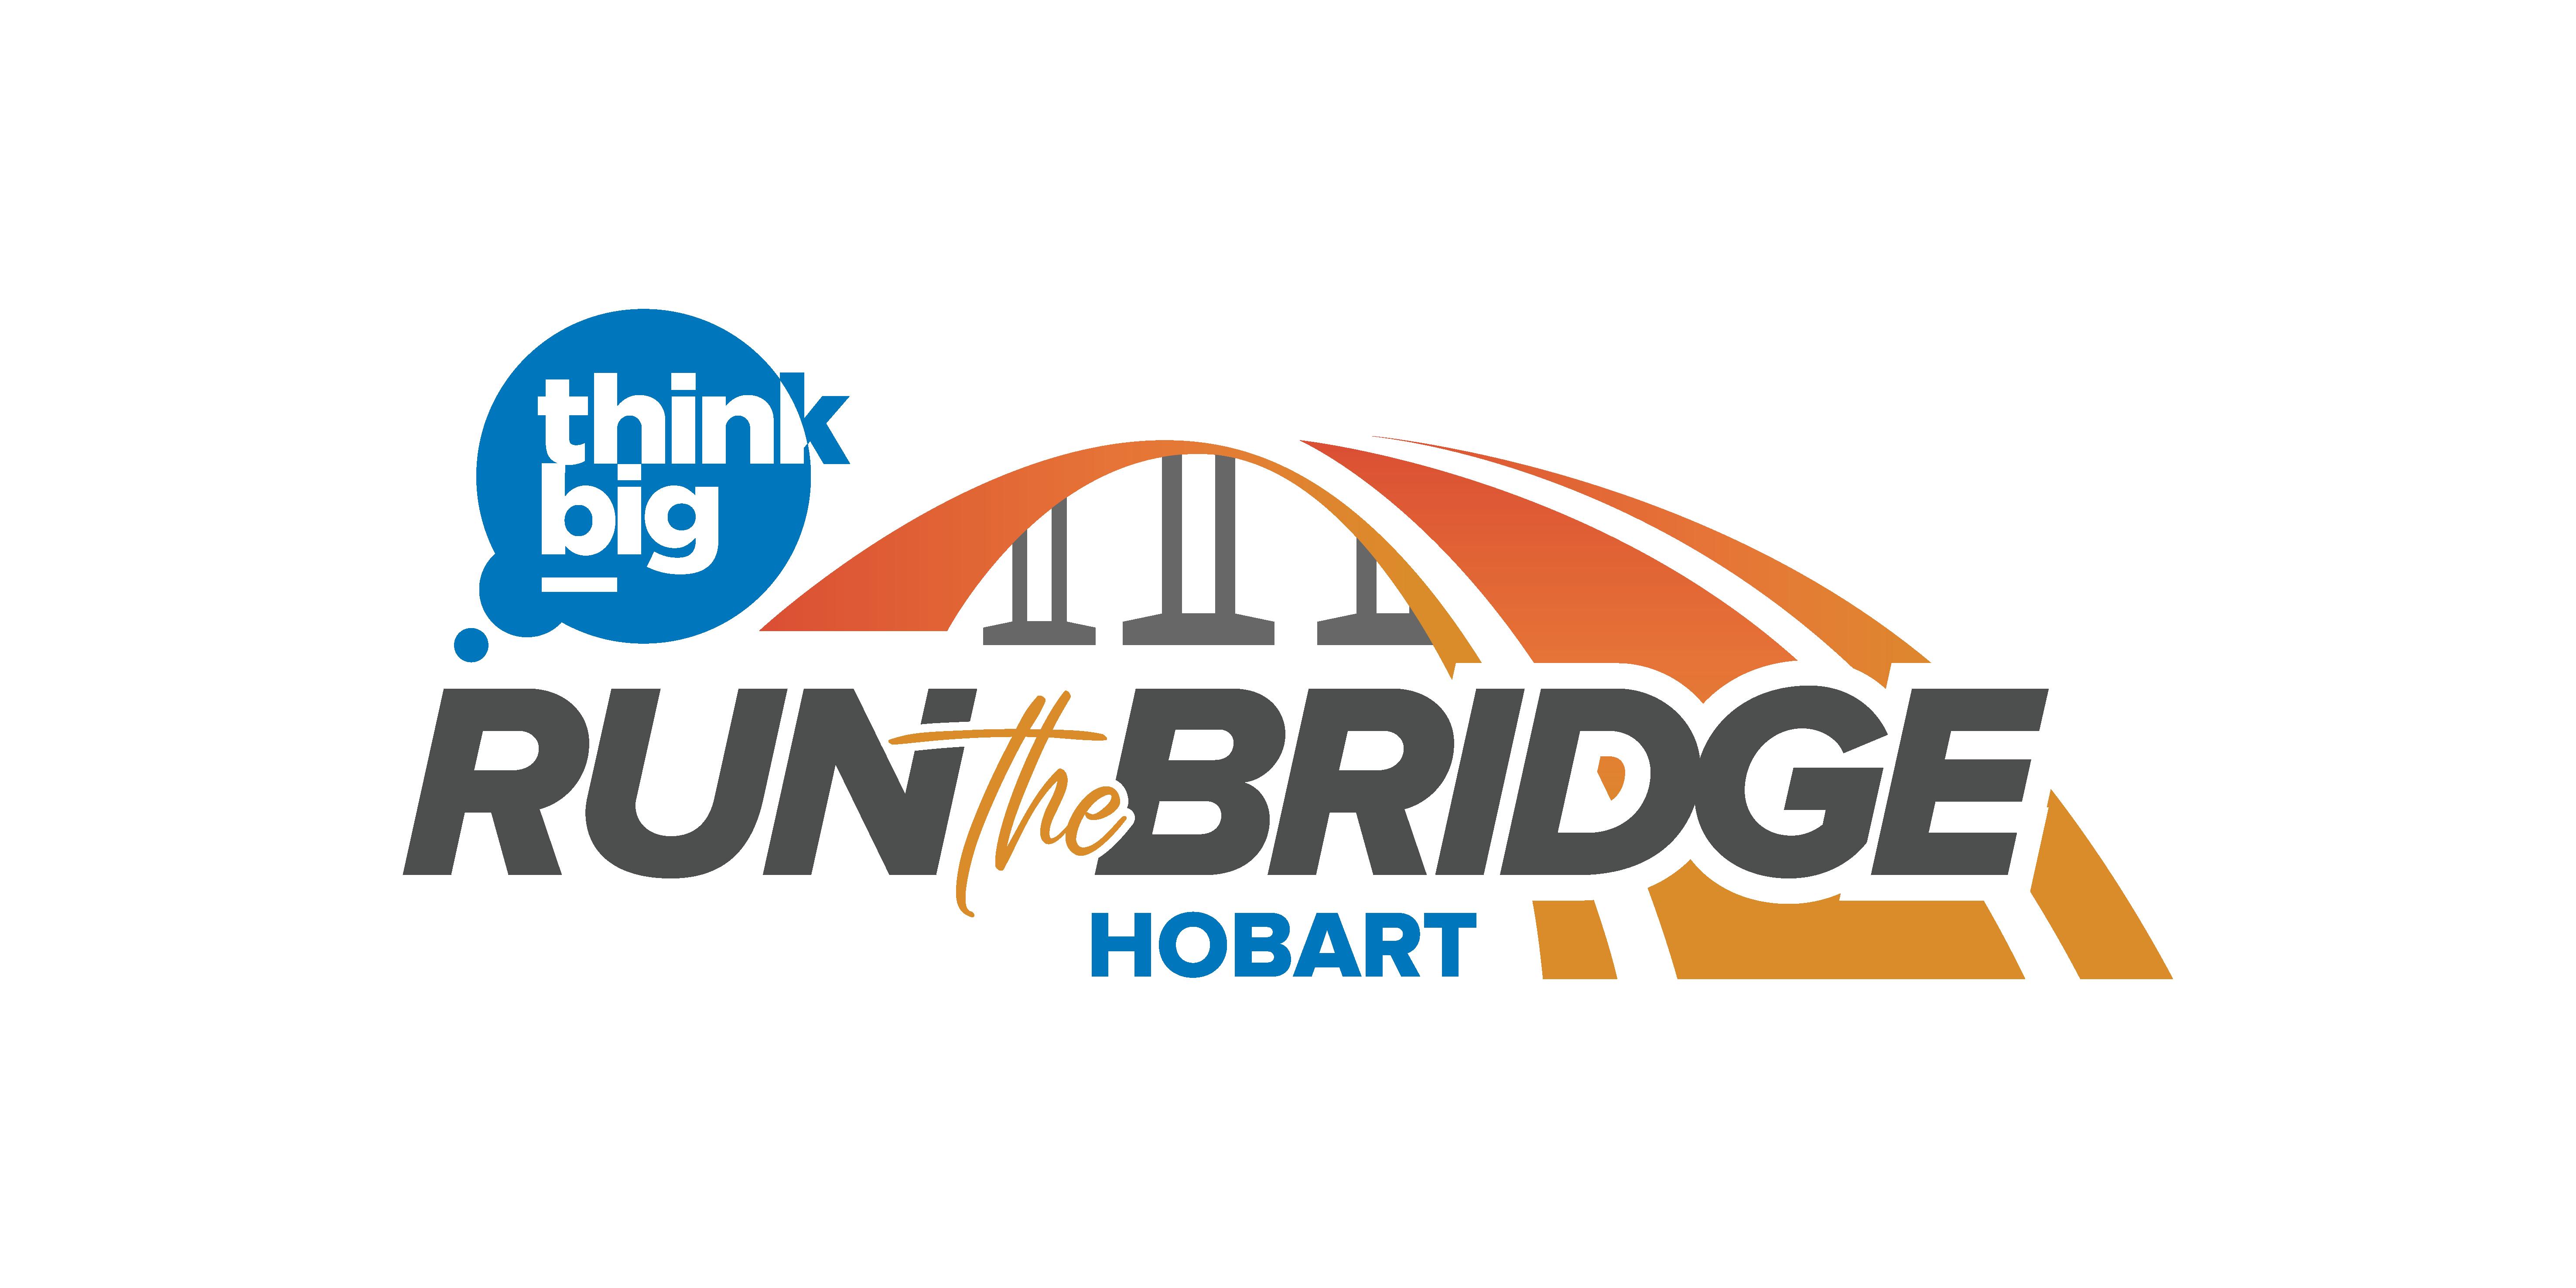 run the bridge logo in colour